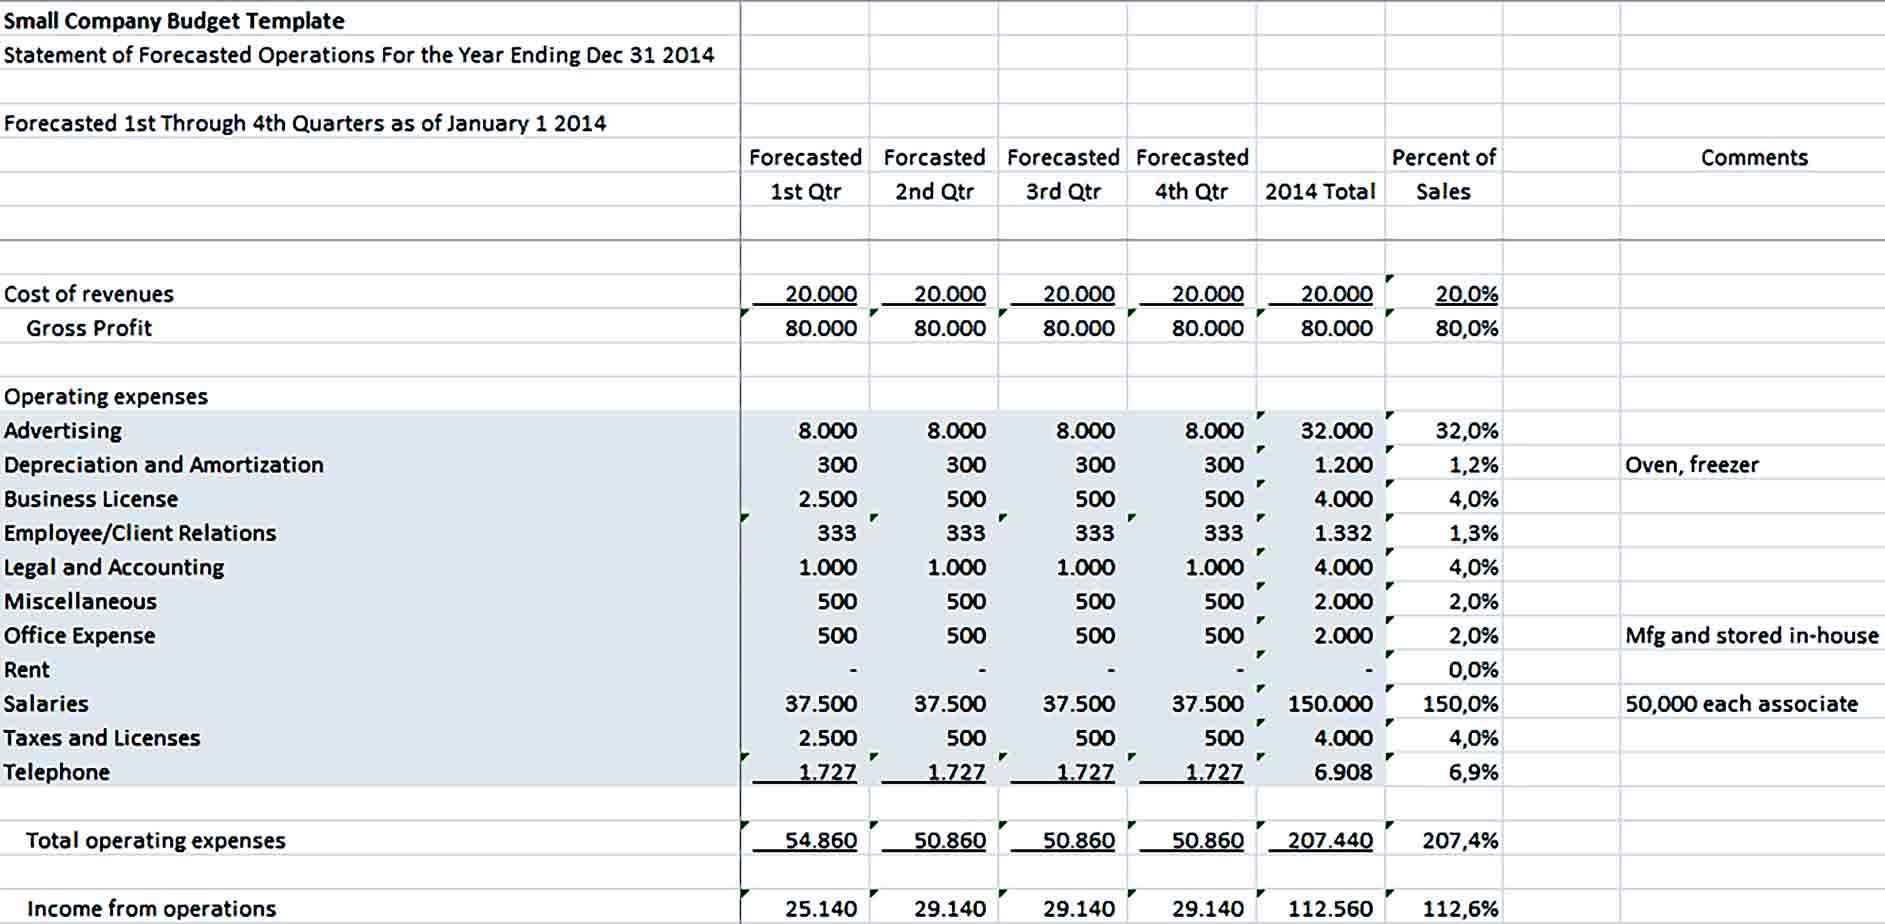 Sample Small Company Budget 1 1